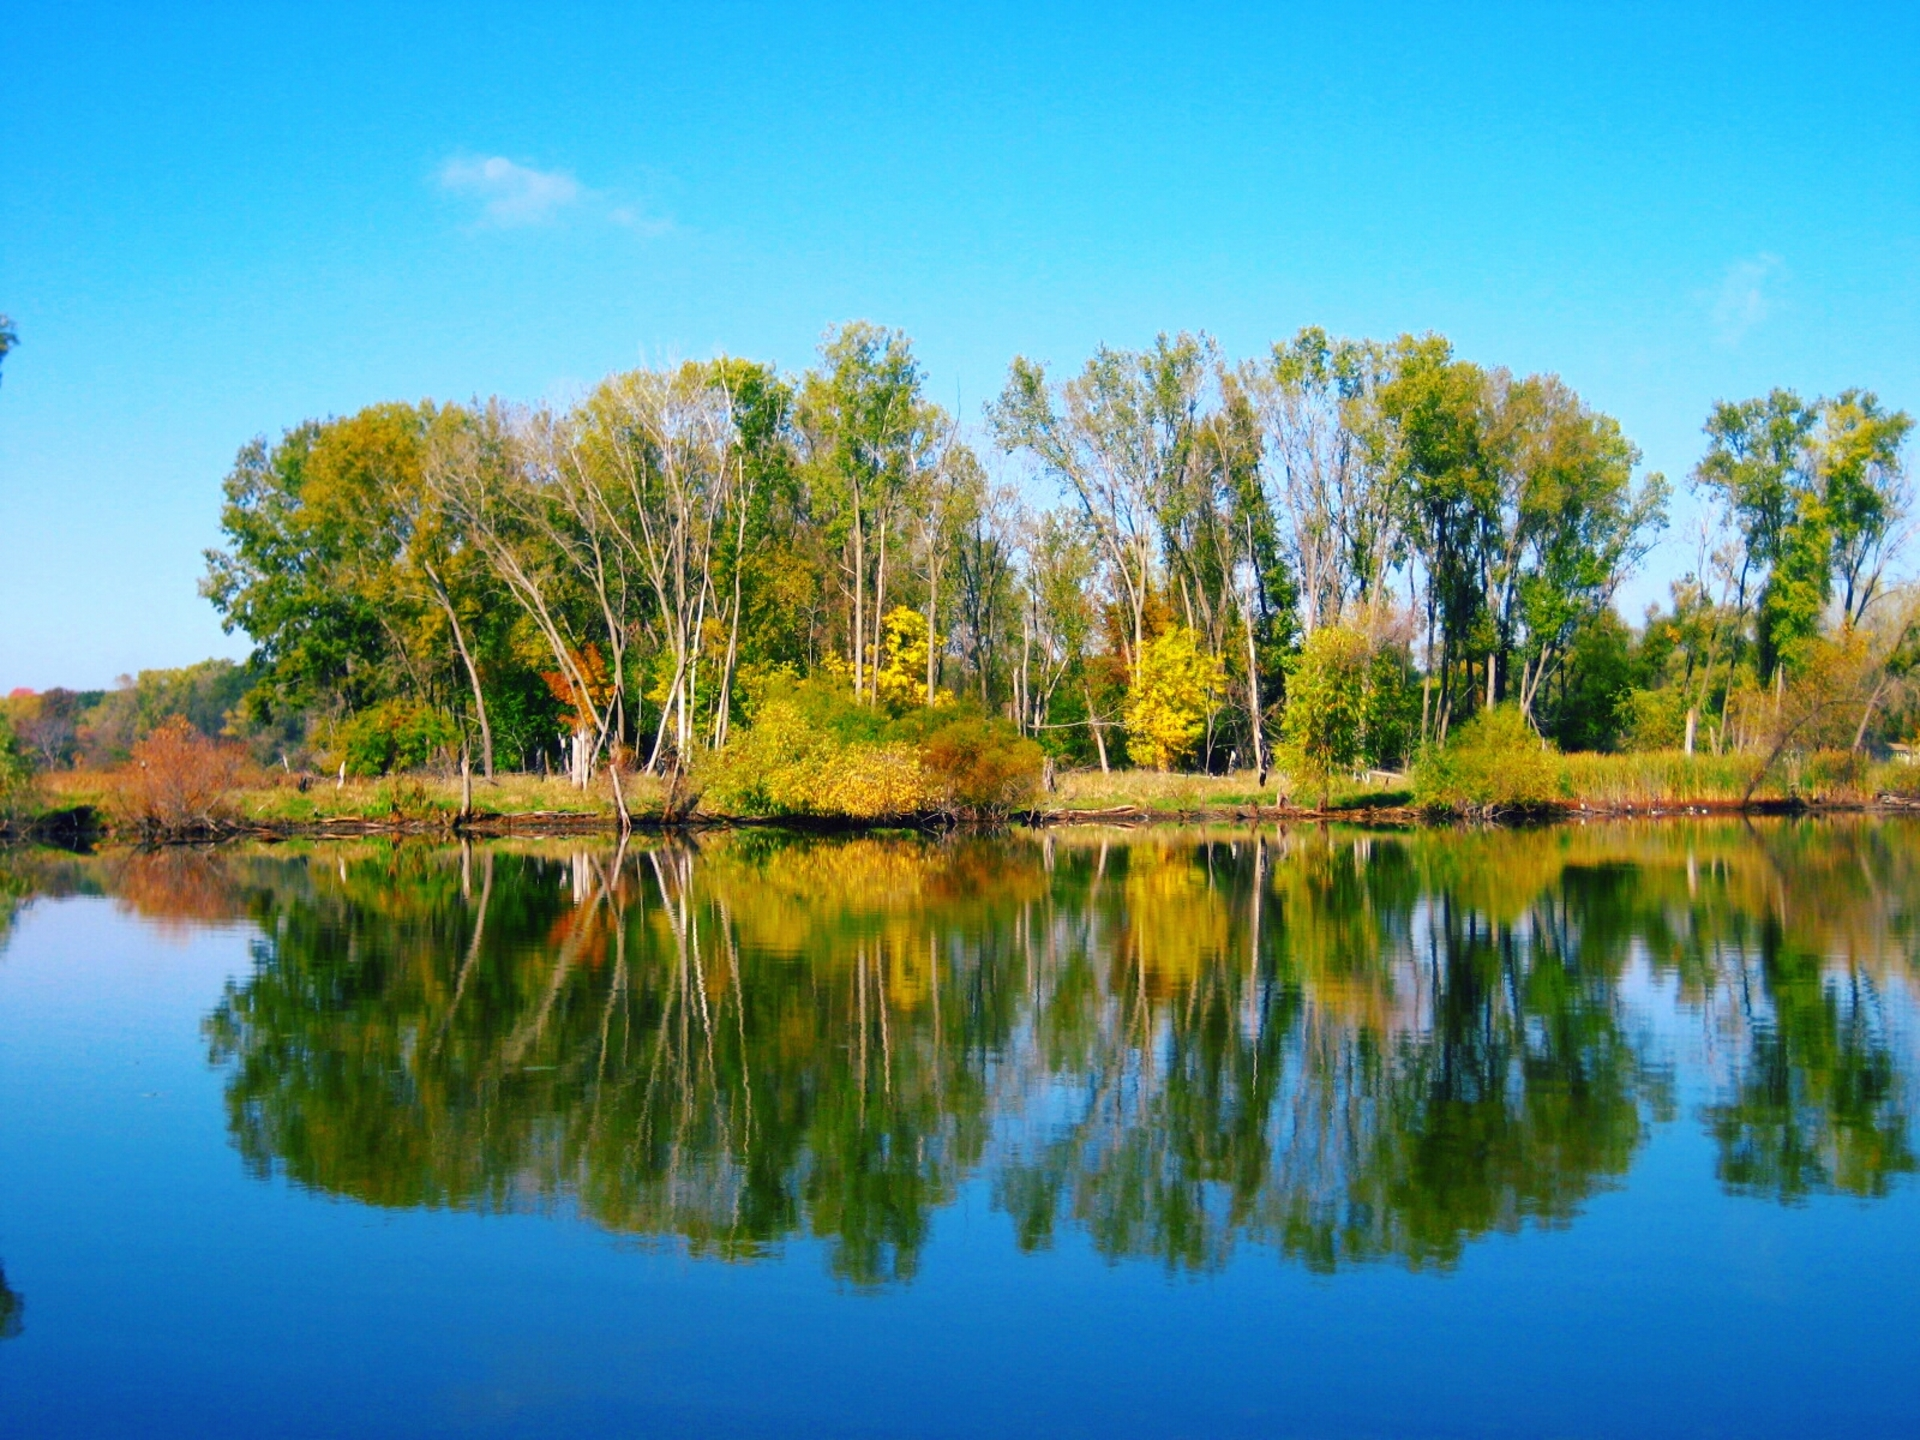 Reflection | shalicia.johnson, calm, forest, lake